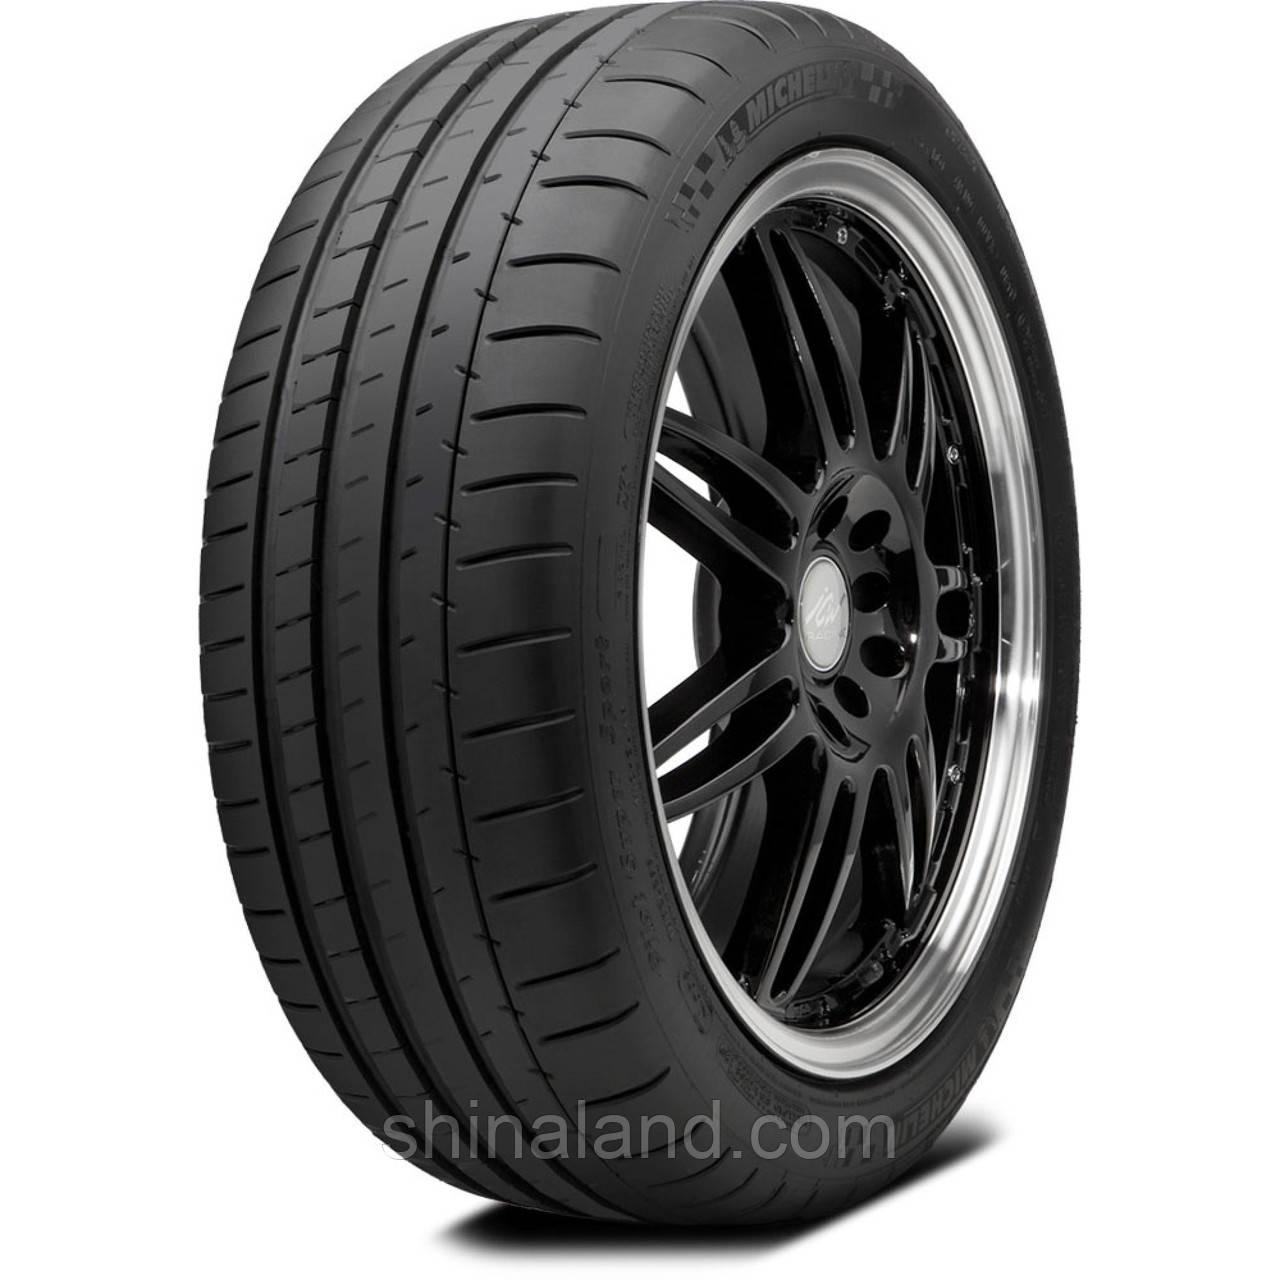 Шини Michelin Pilot Super Sport 265/35 R19 98Y XL NO Франція 2020 (літо) (кт)